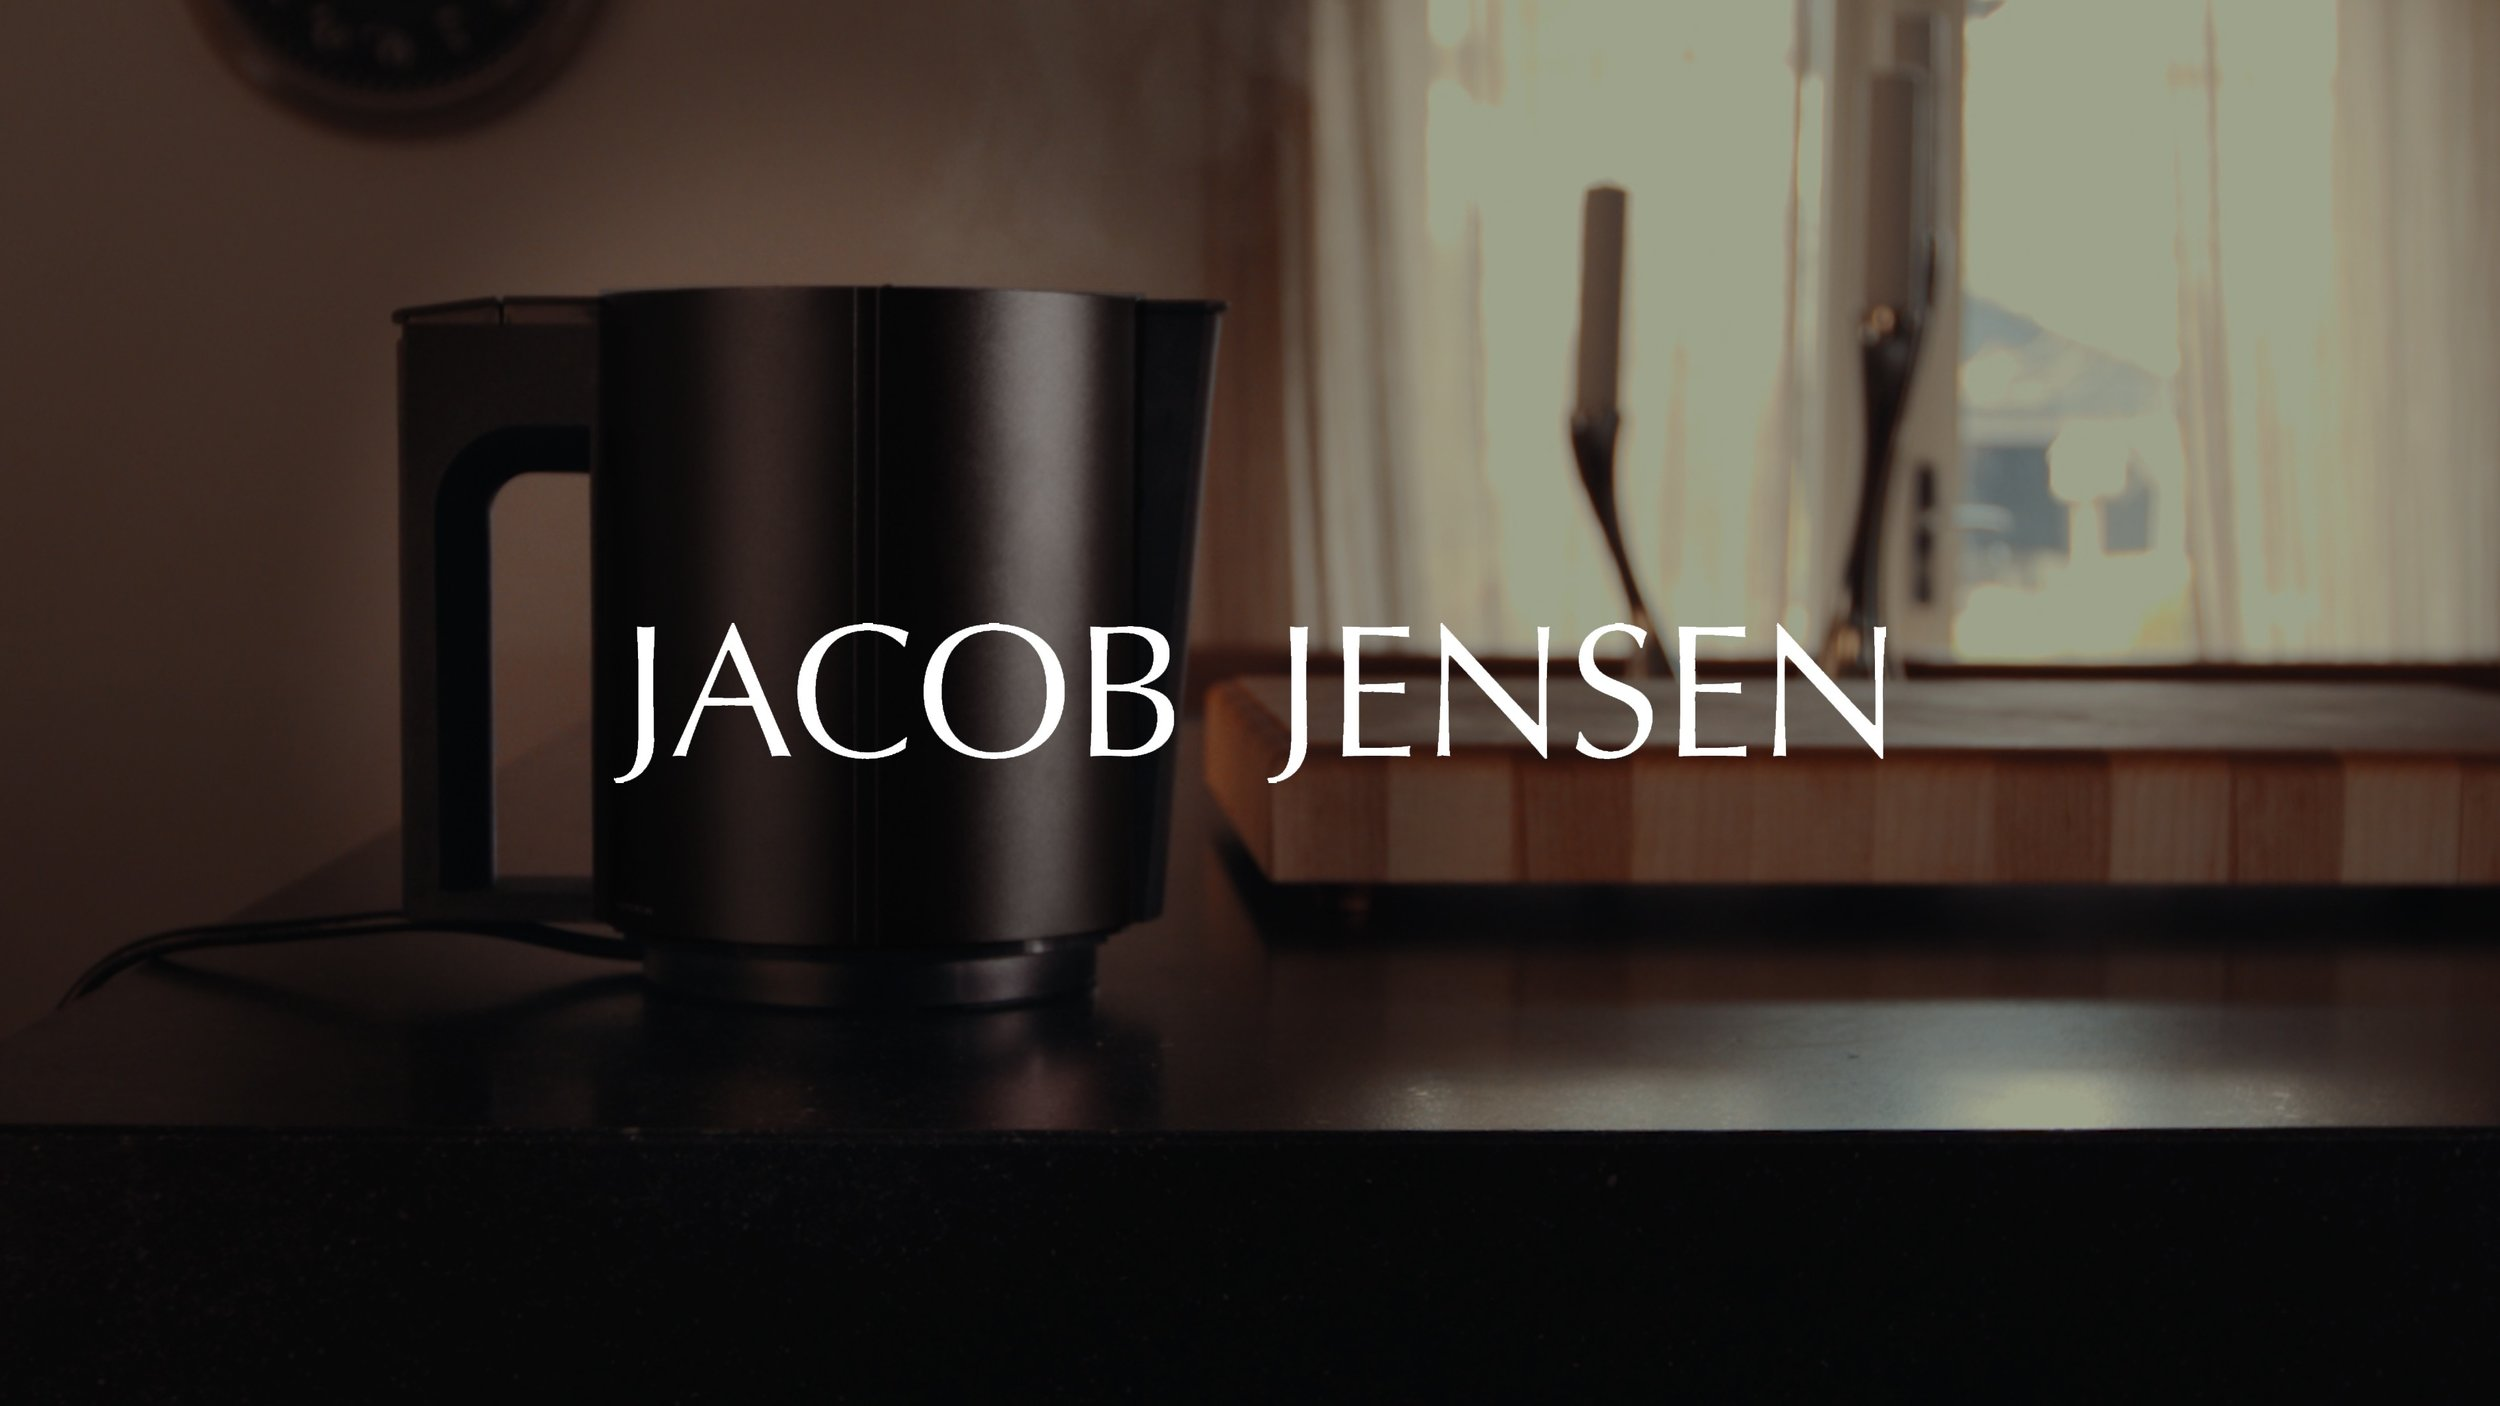 T_Jacob_Jensen-squashed.jpg